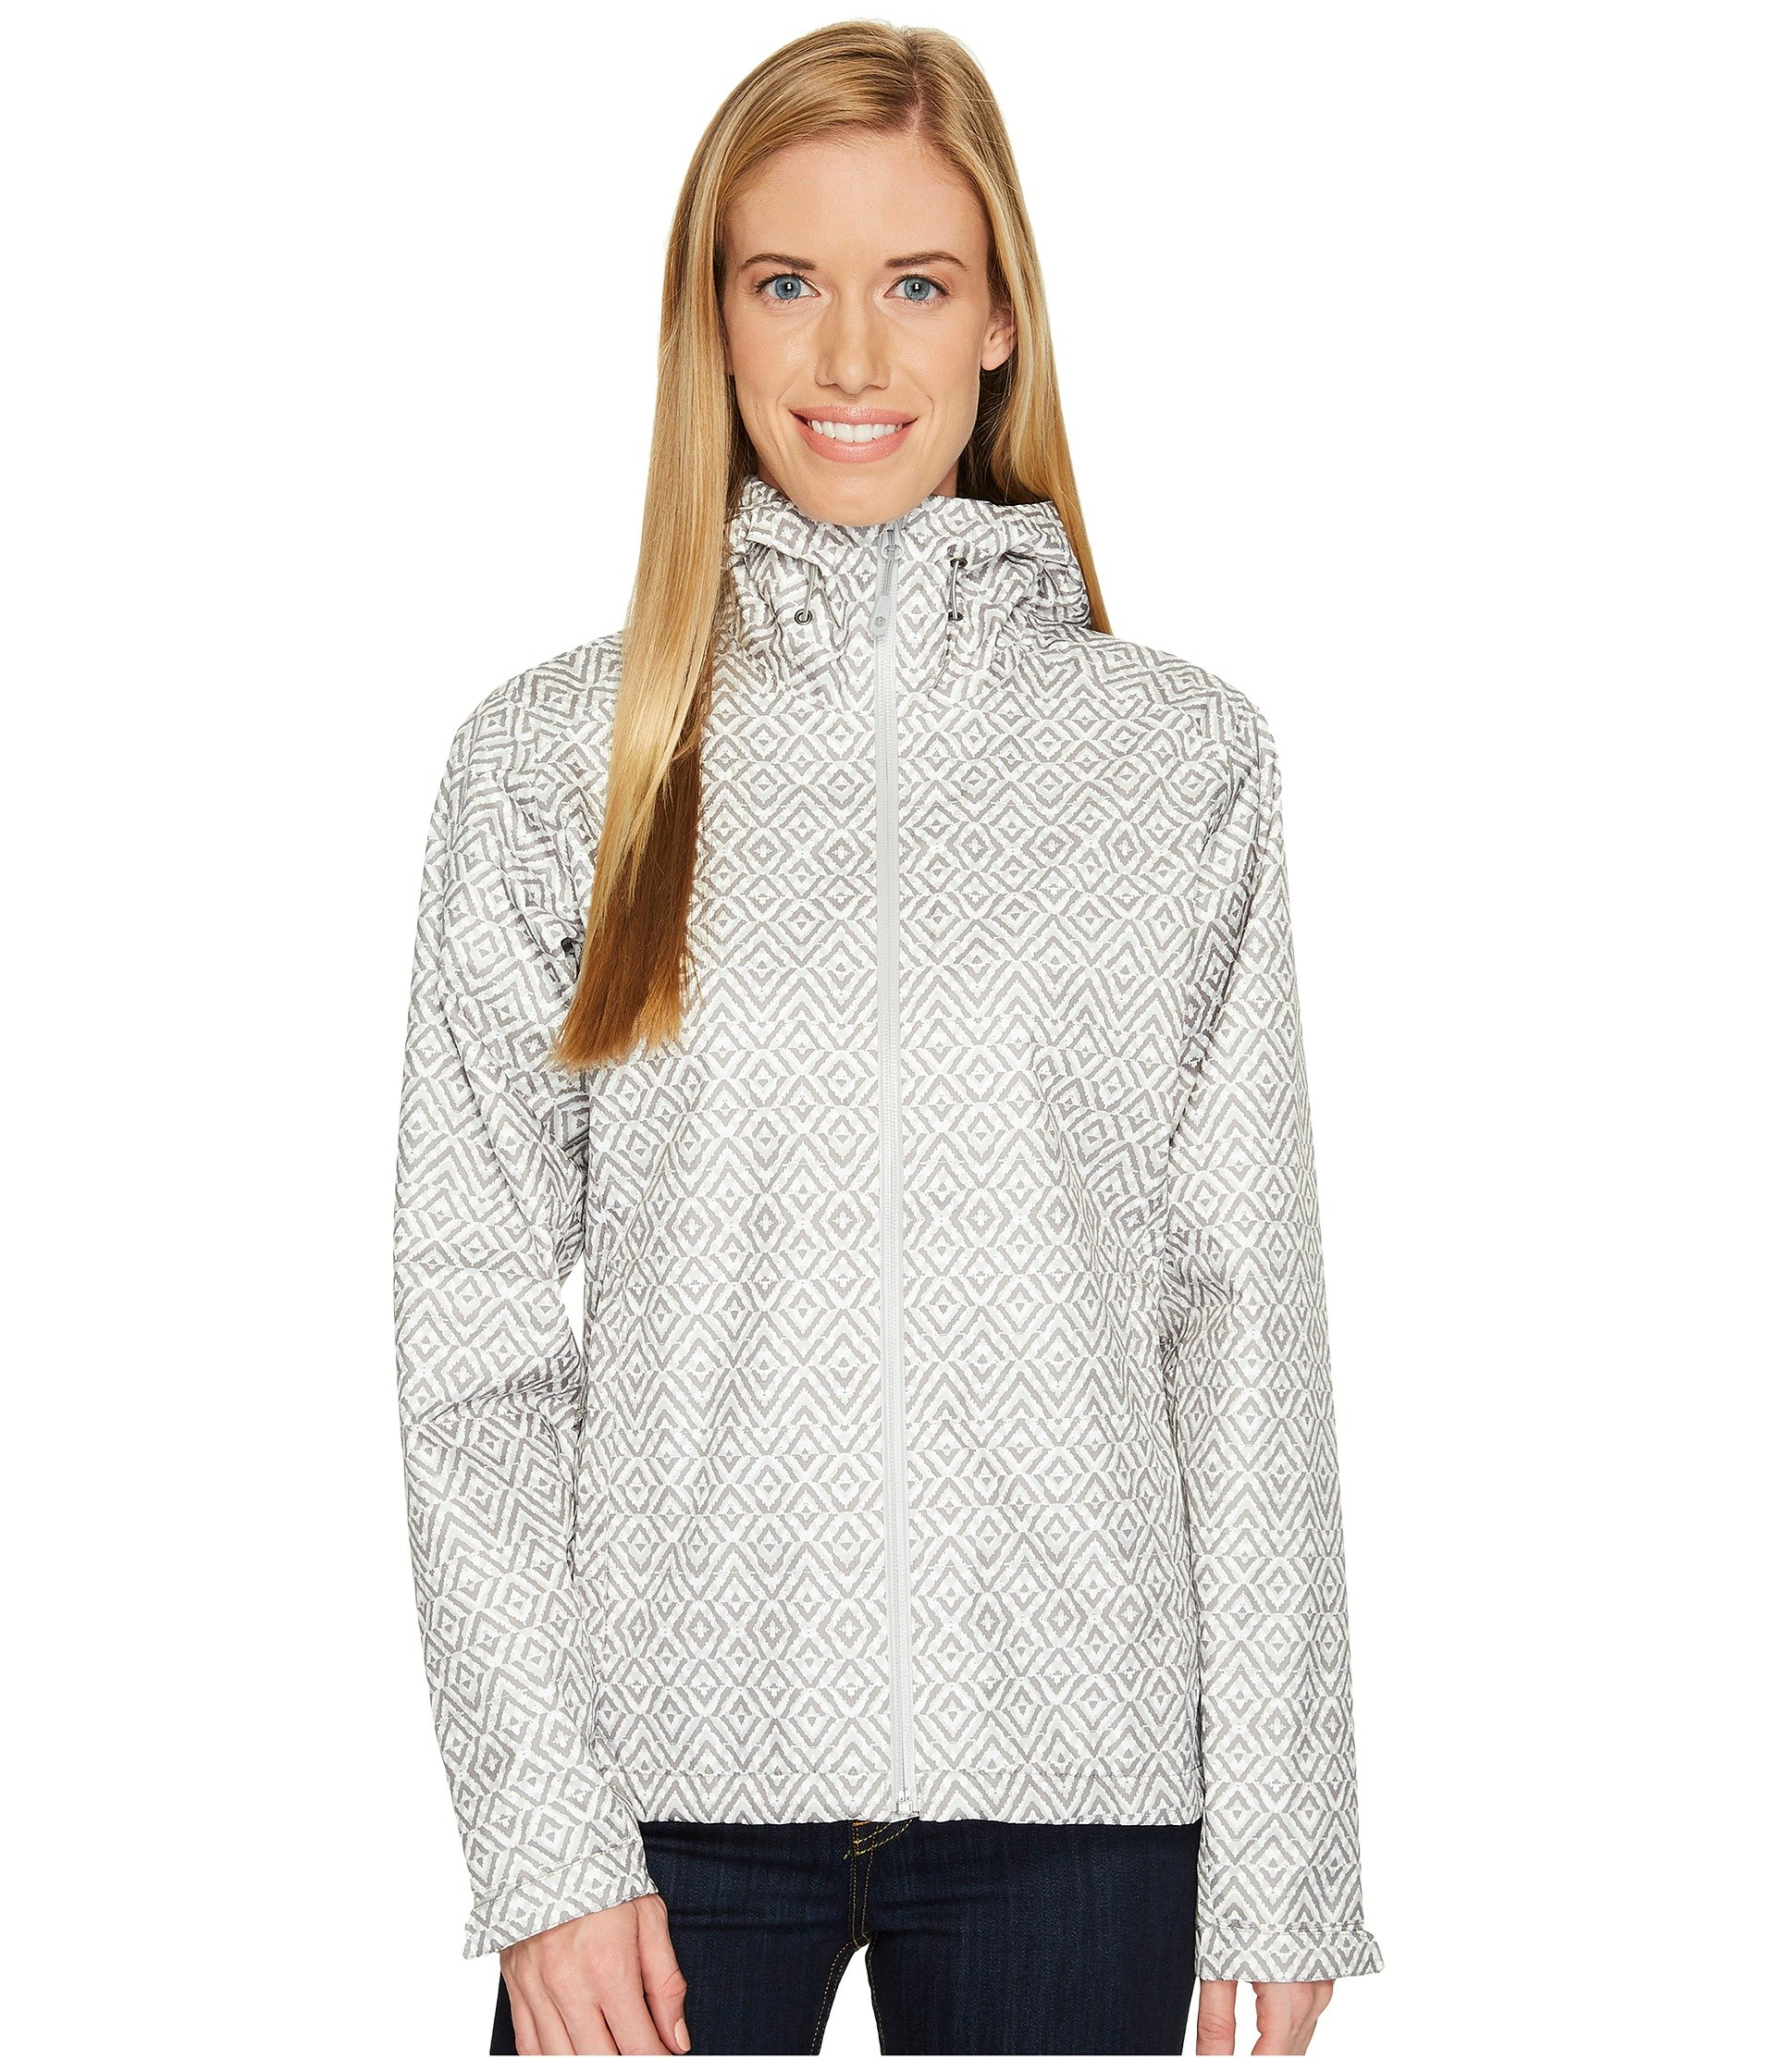 MOUNTAIN HARDWEAR Finder™ Jacket, Grey Ice